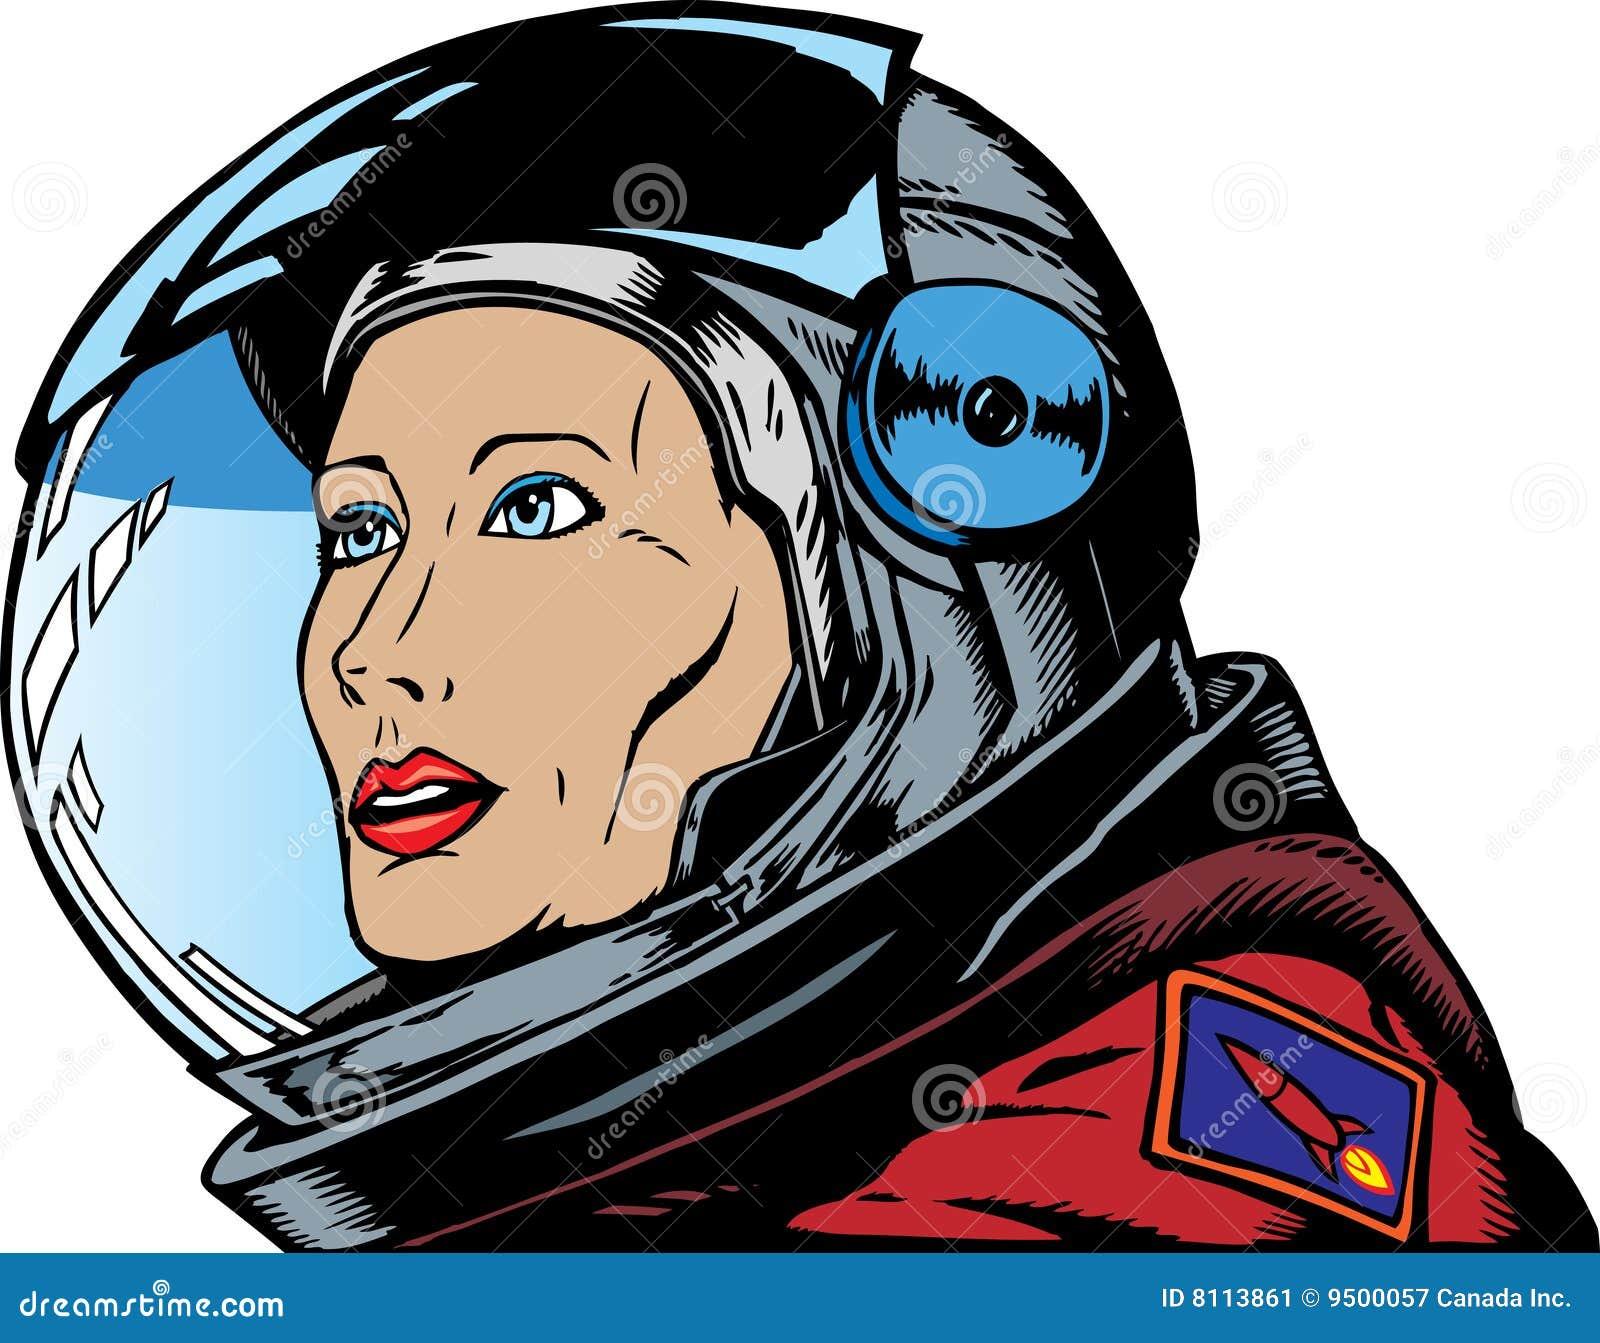 female astronaut clipart - photo #26